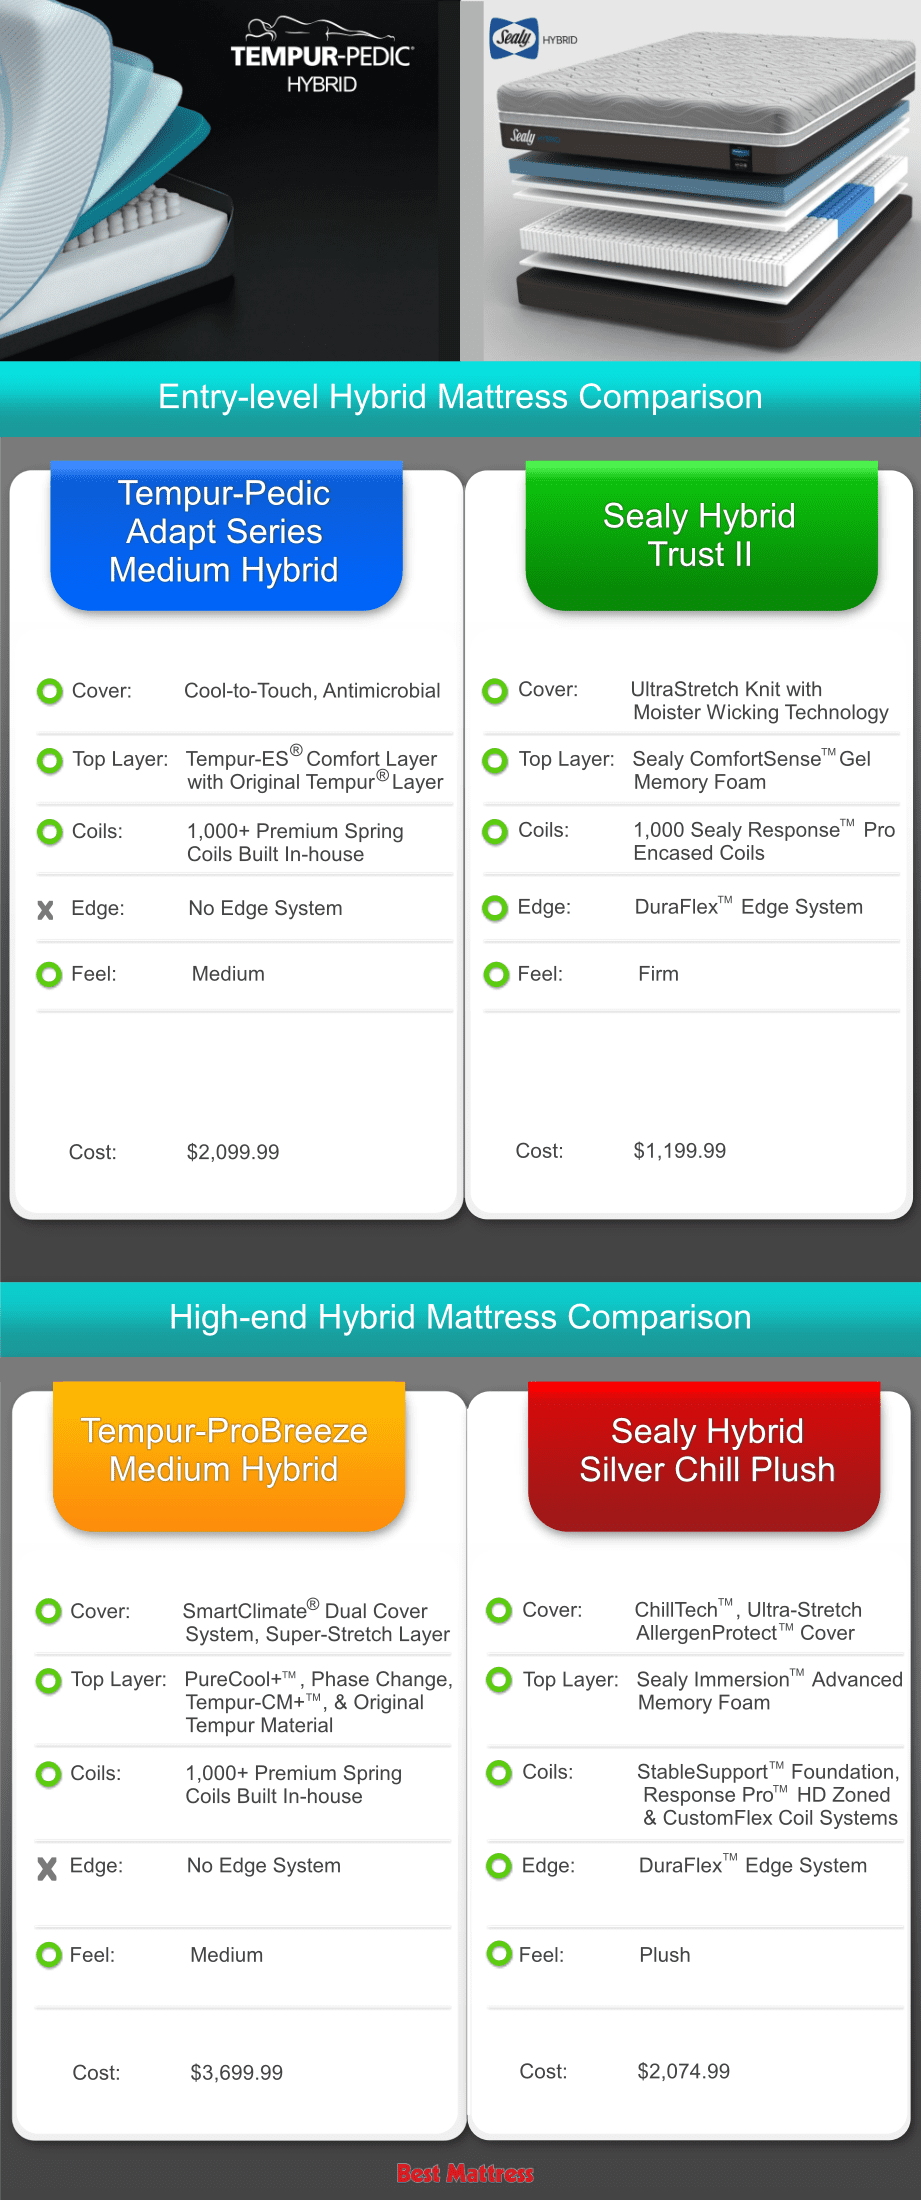 Sealy Hybrid vs Tempur-Pedic Hybrid Comparison